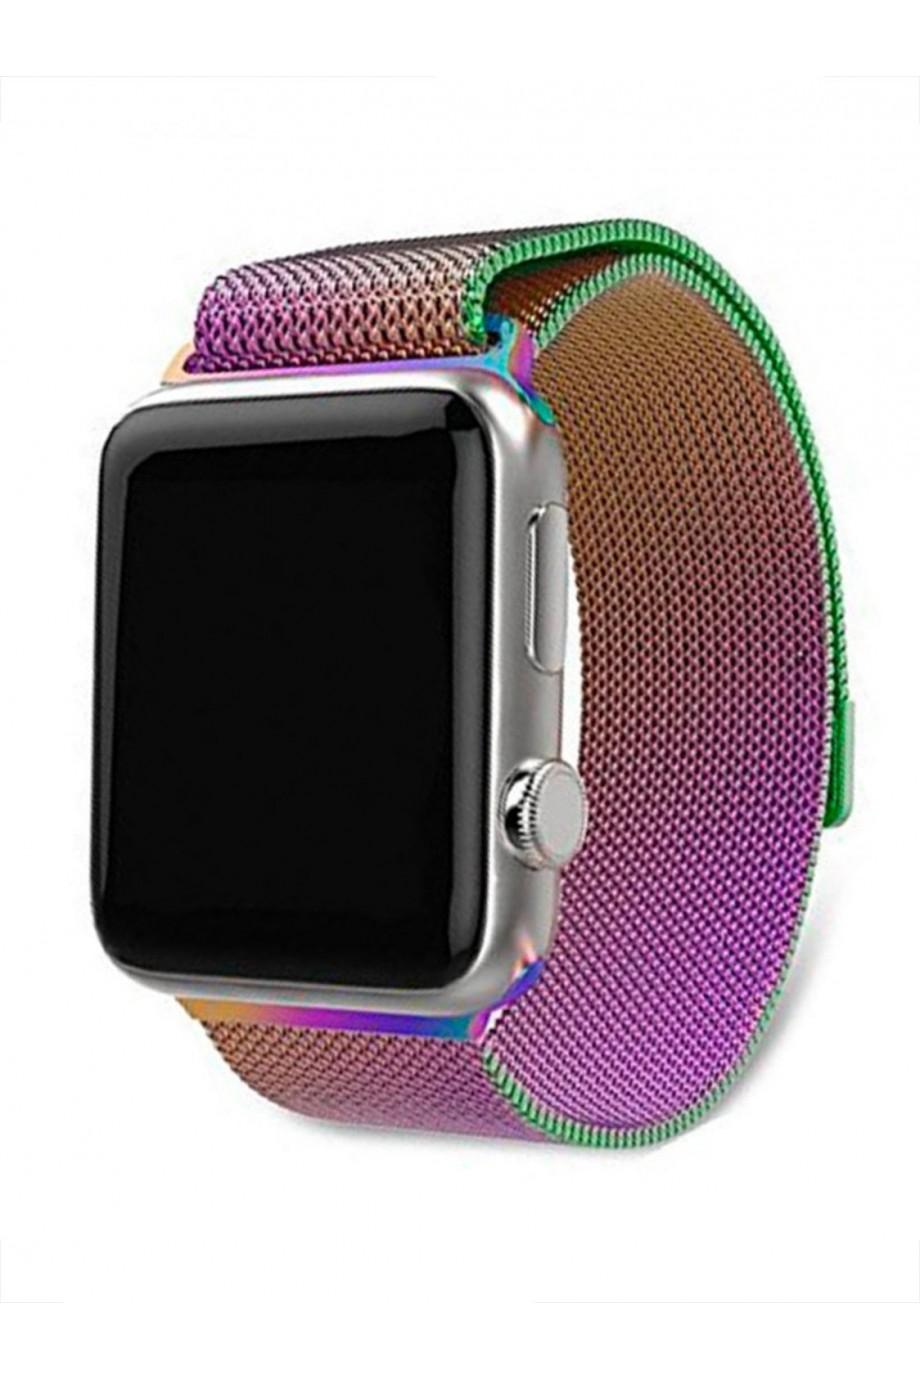 Металлический ремешок для Apple Watch 3 38 мм, hardened